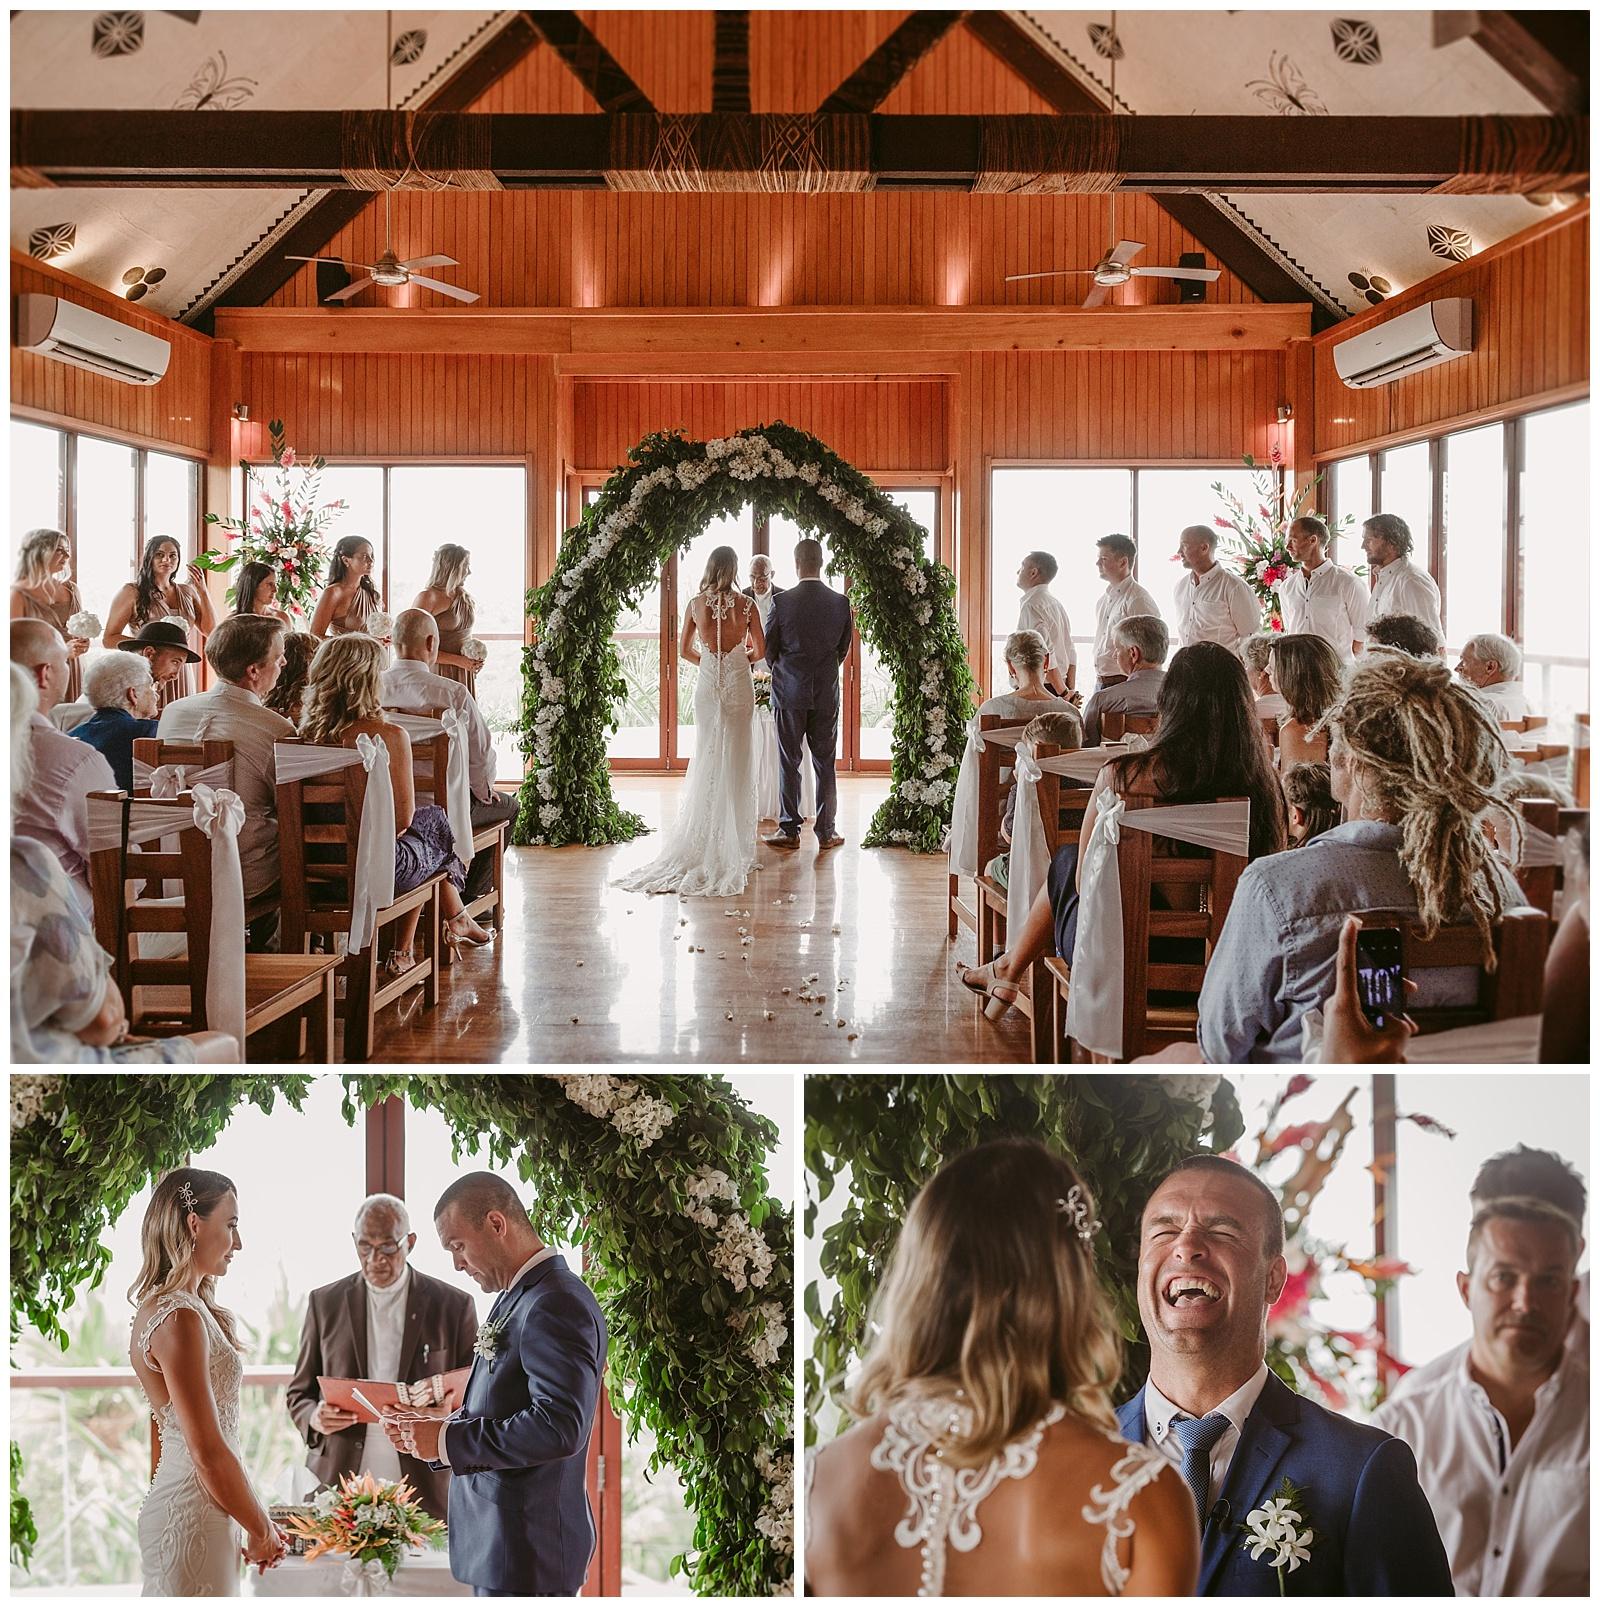 FIJI wedding photographer popcorn photography_0028.jpg